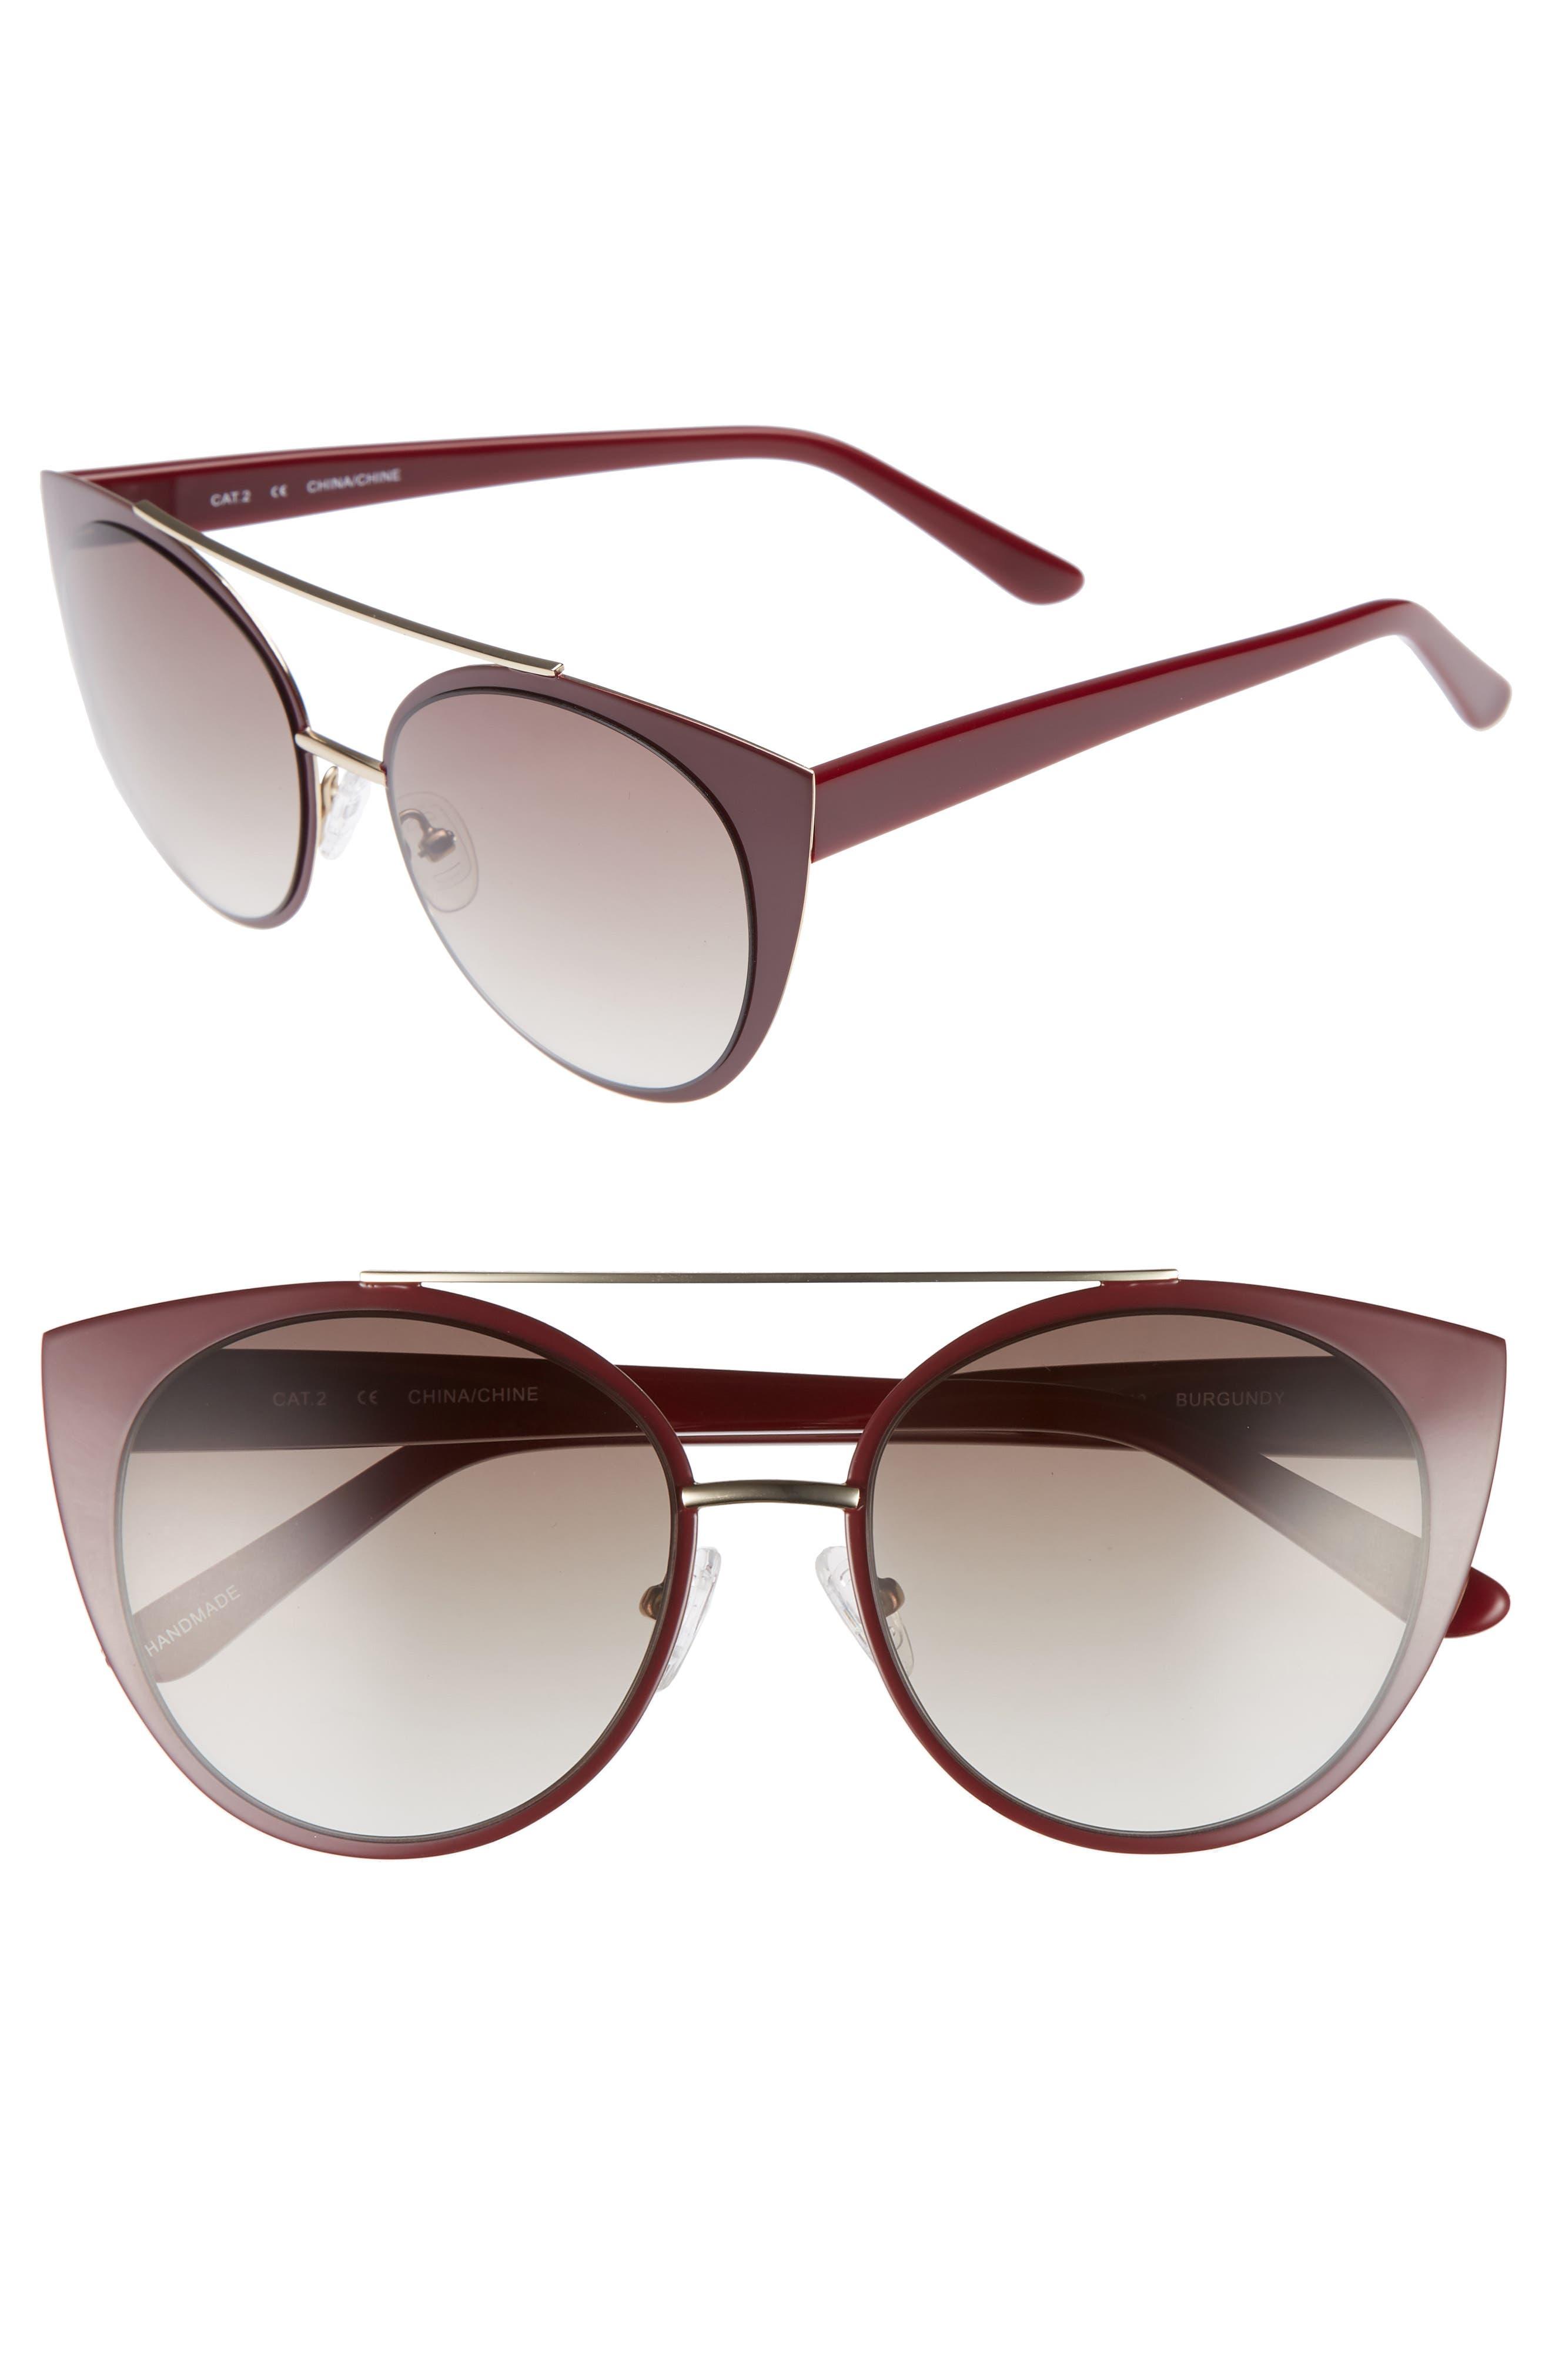 Amelia 53mm Aviator Sunglasses,                             Main thumbnail 1, color,                             930